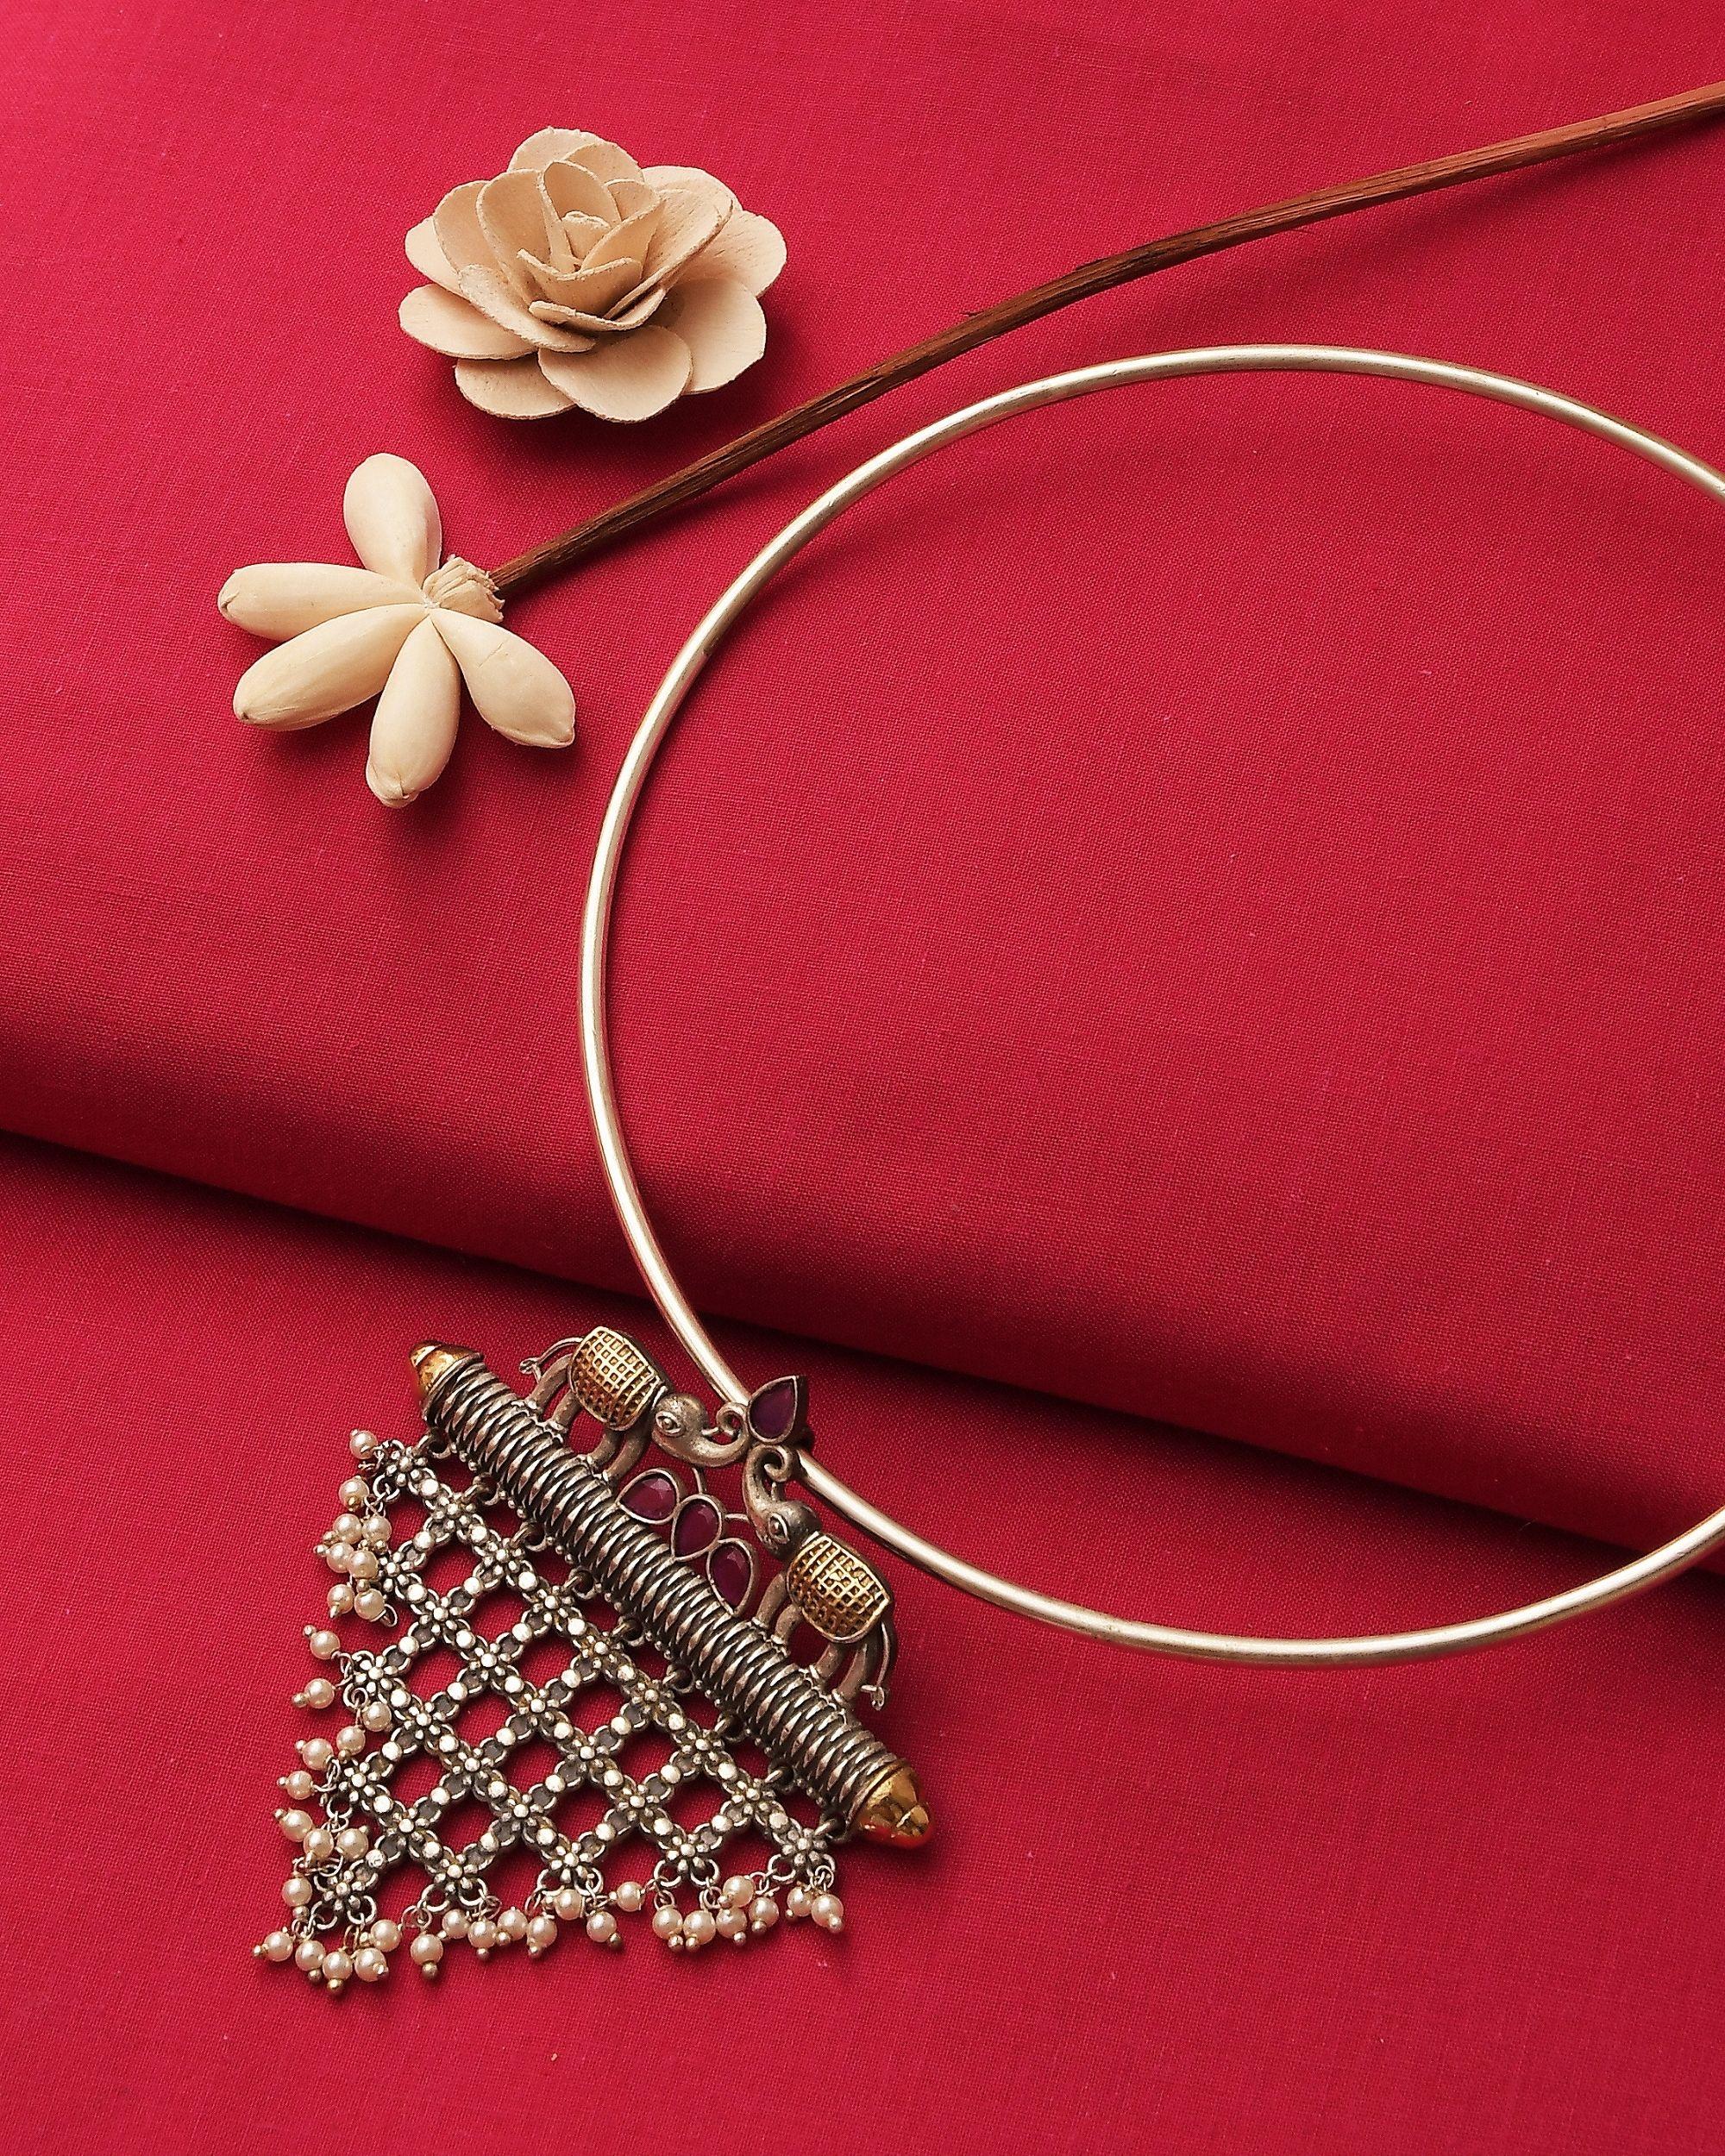 Elephant jali motif dual tone necklace